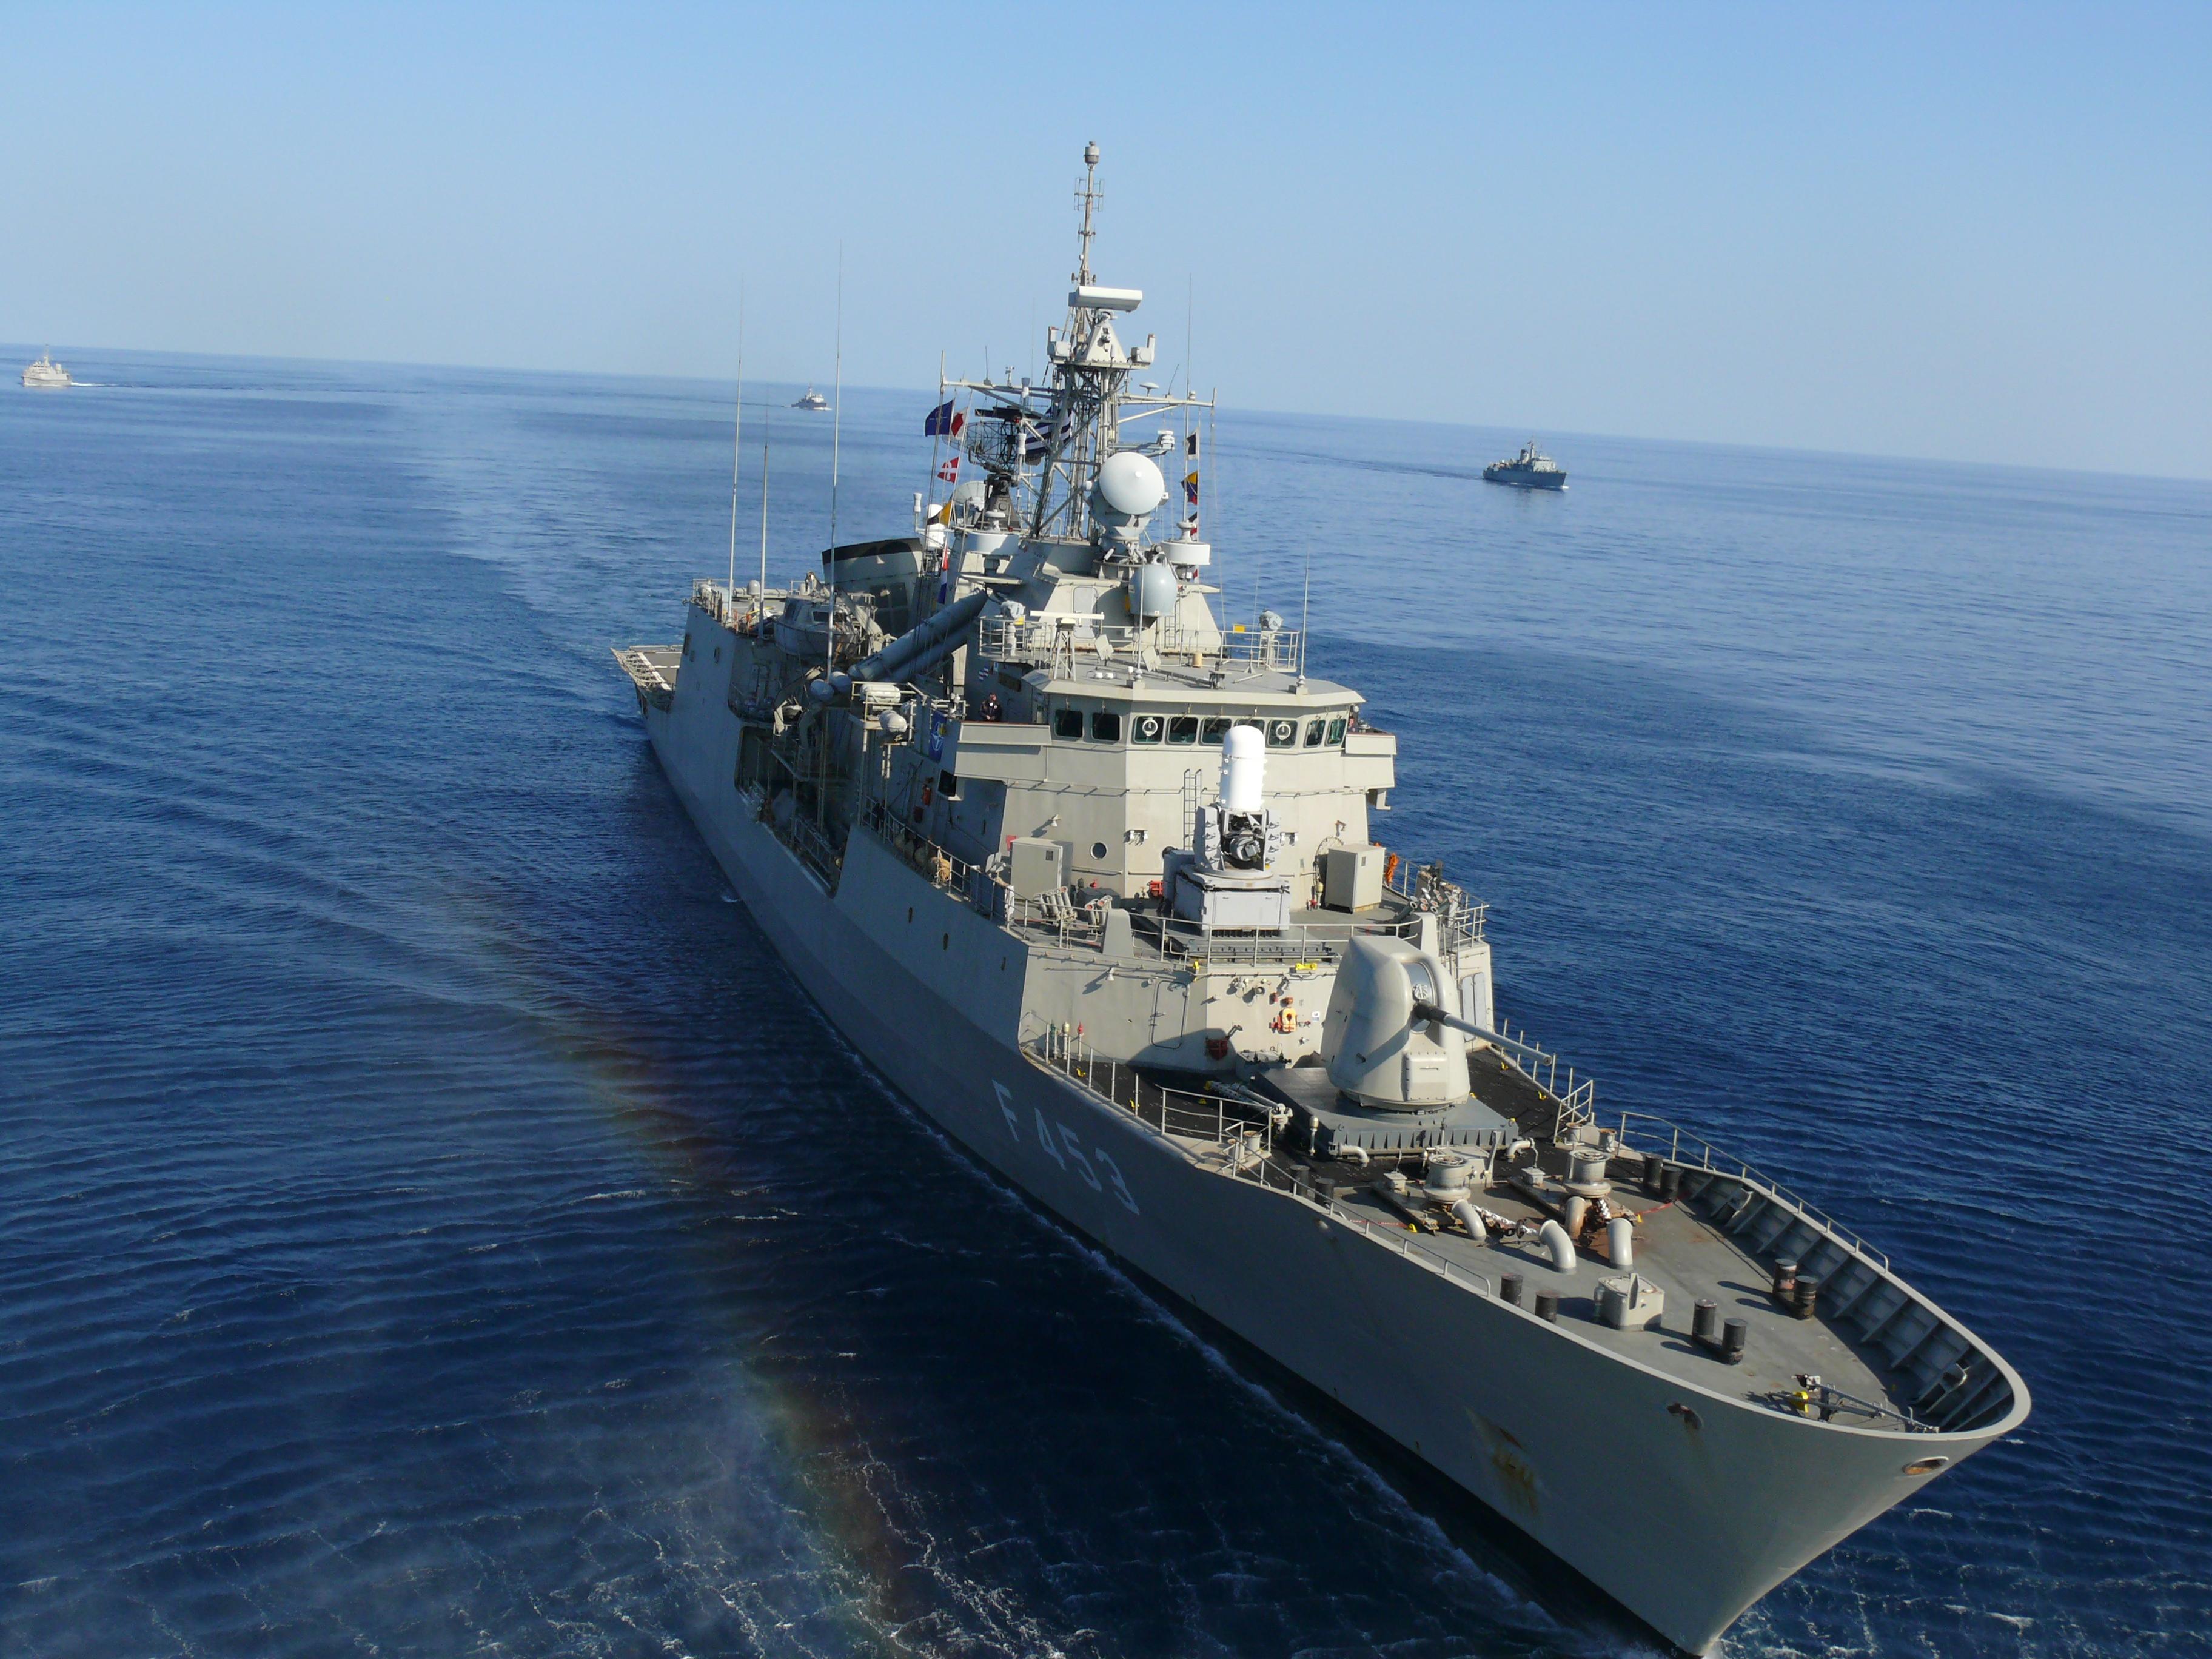 Greek frigate Spetsai